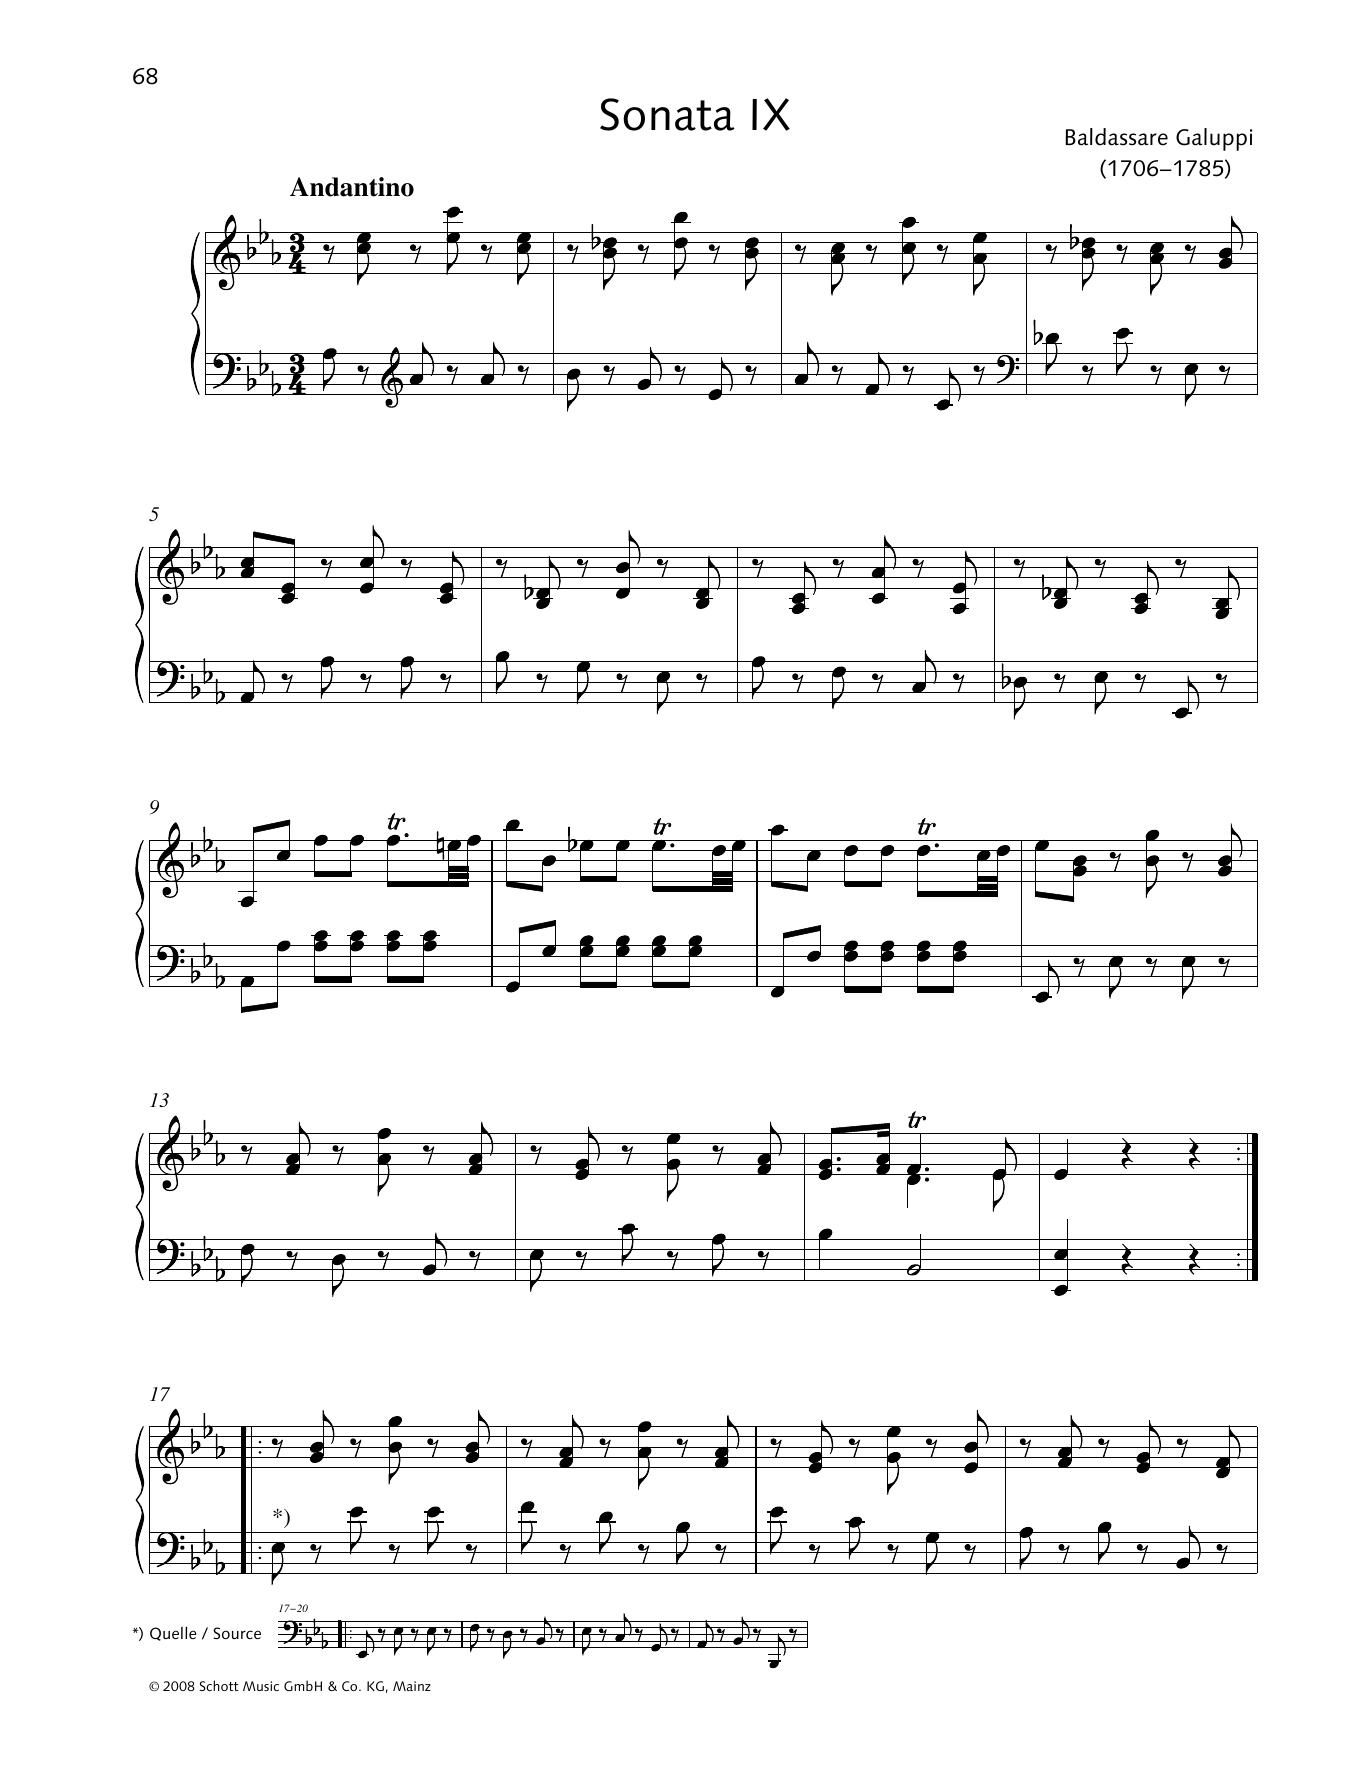 Baldassare Galuppi Sonata IX E-flat major sheet music preview music notes and score for Piano Solo including 6 page(s)